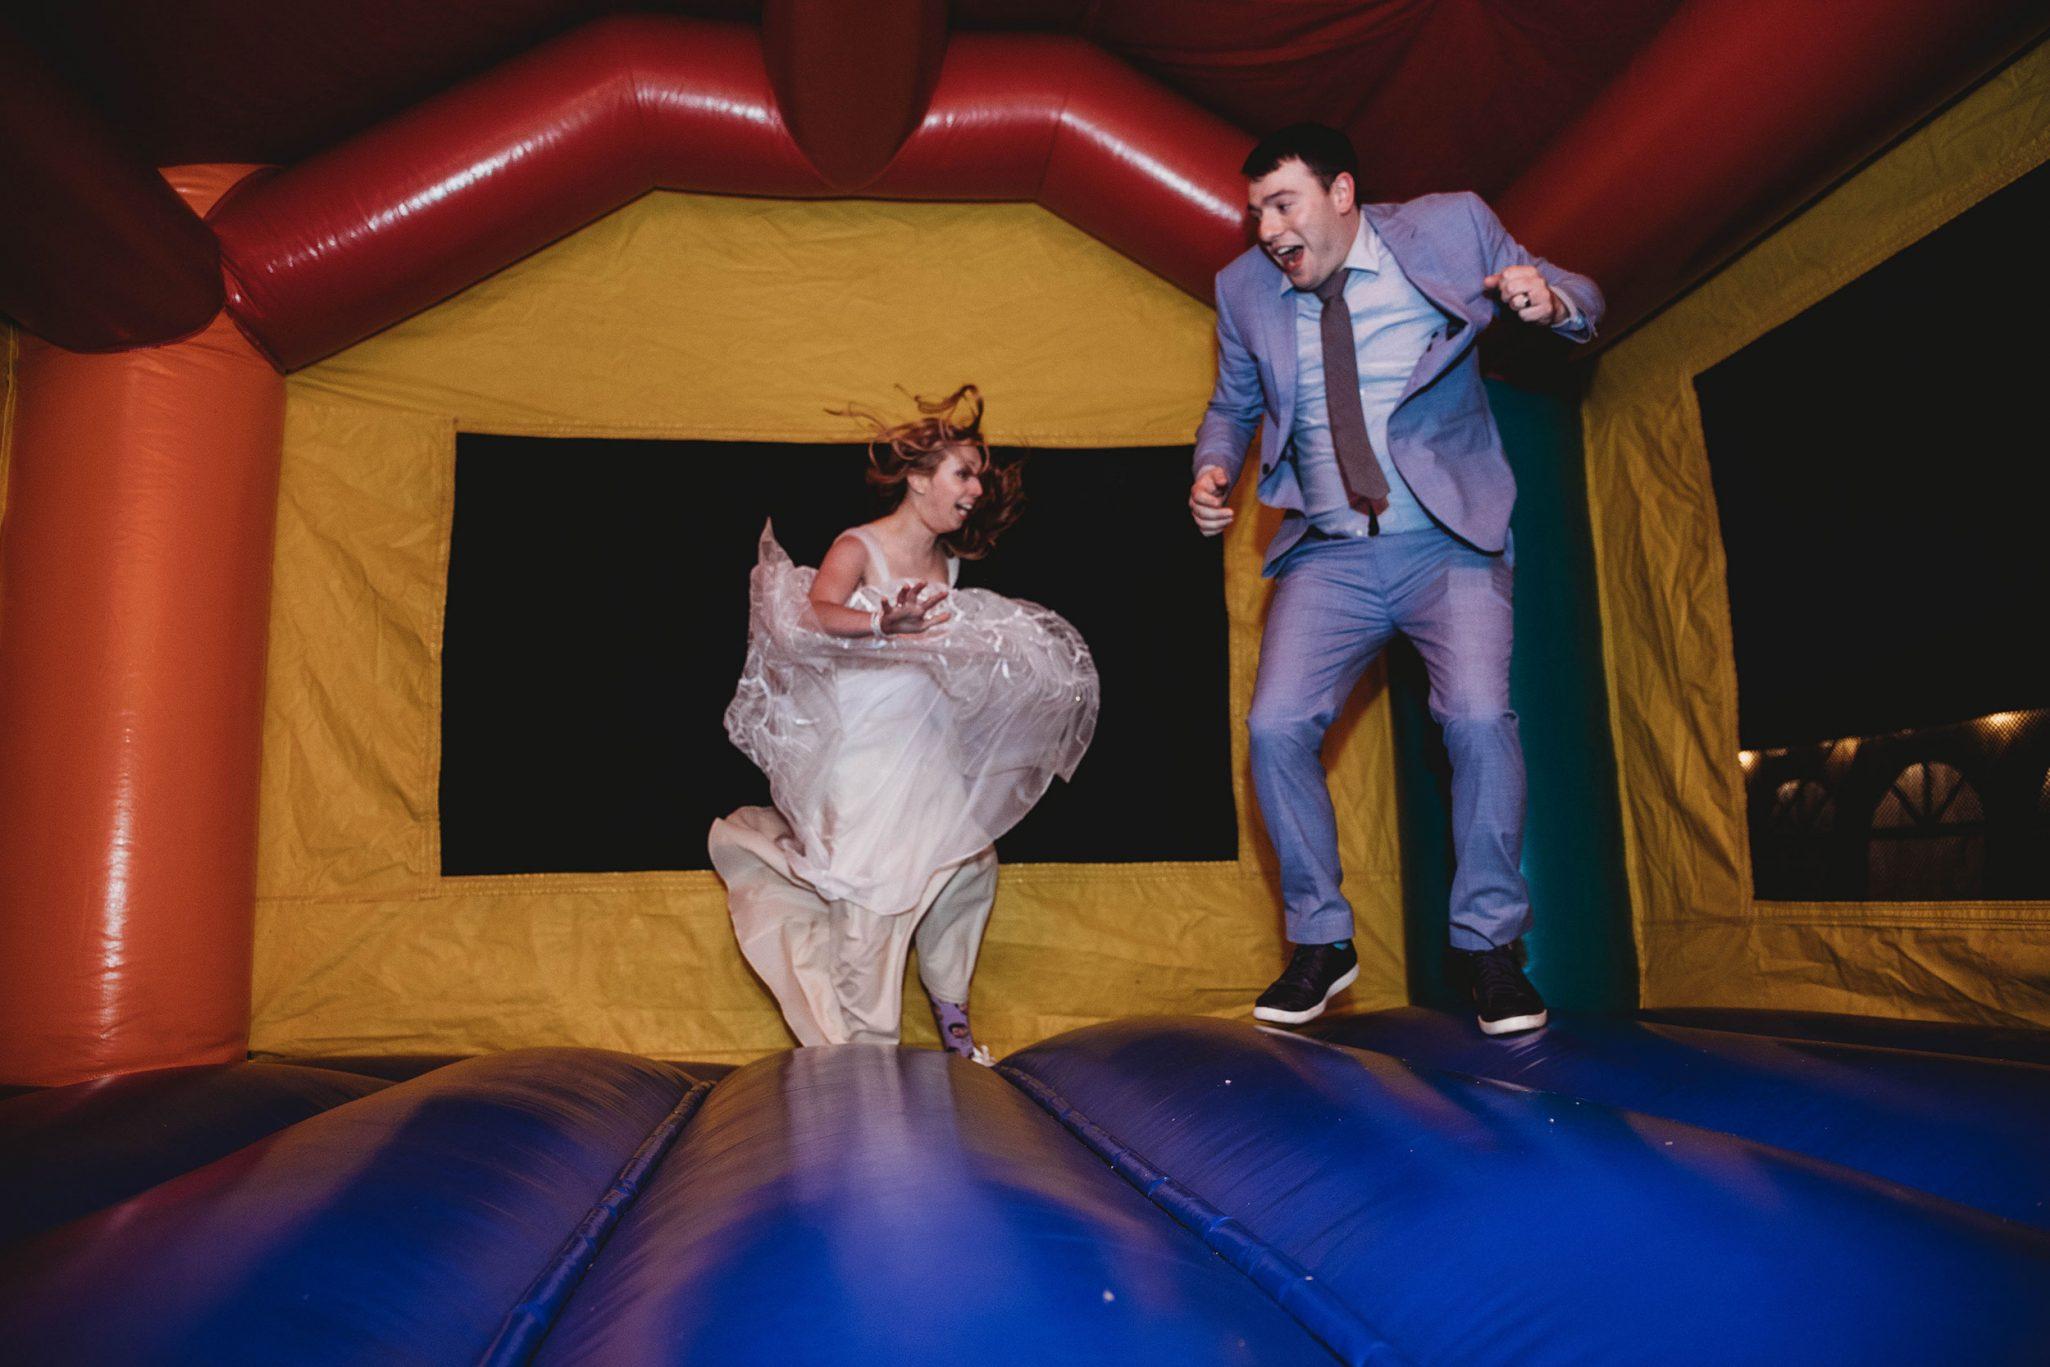 Wedding reception fun with a bounce house